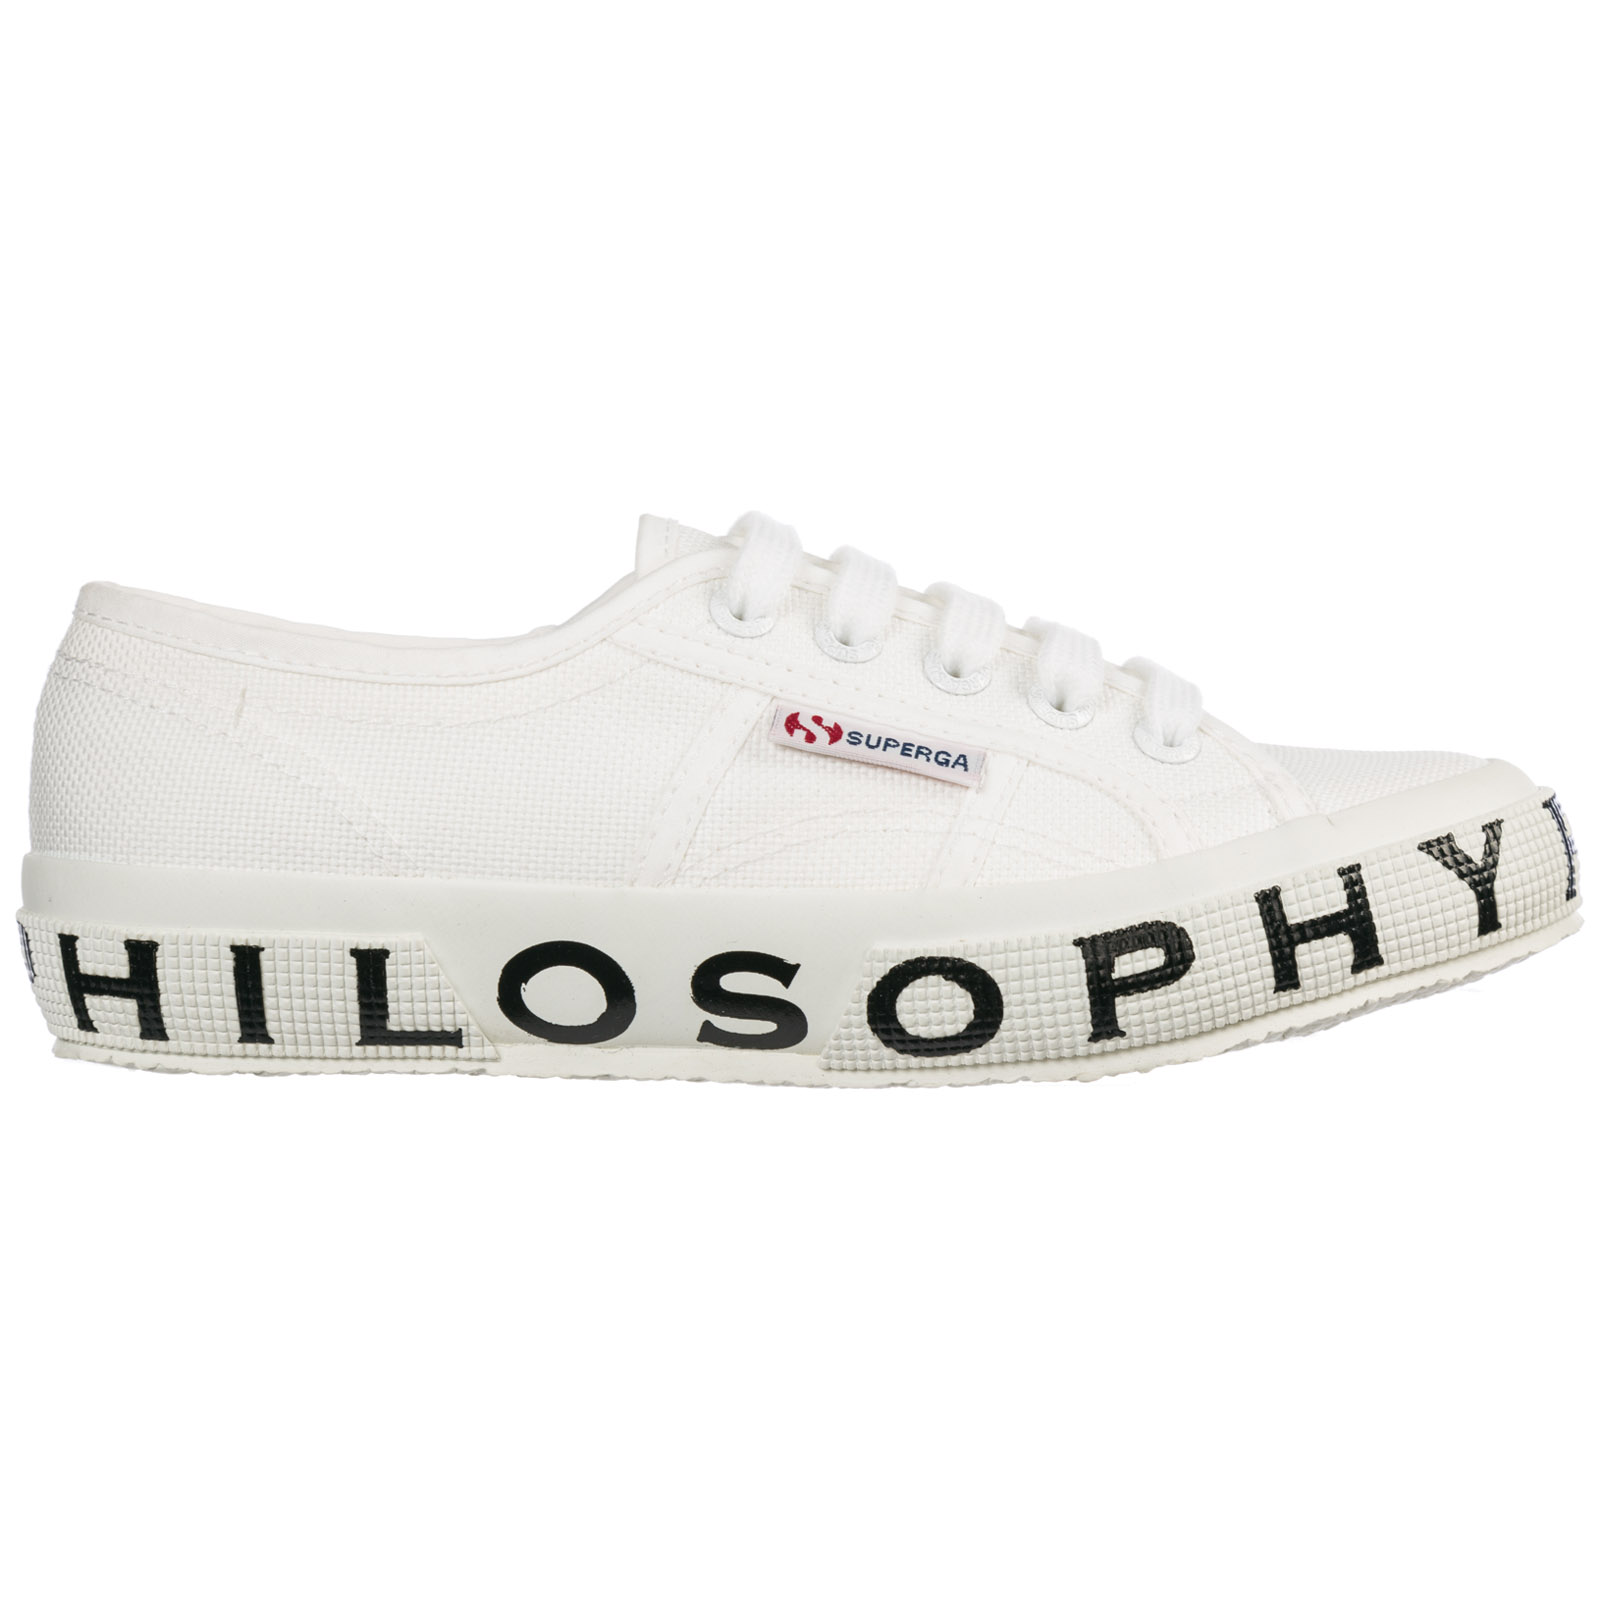 Sneakers Philosophy di Lorenzo Serafini Superga 182C J320171700001 ... 0f6d6897faa